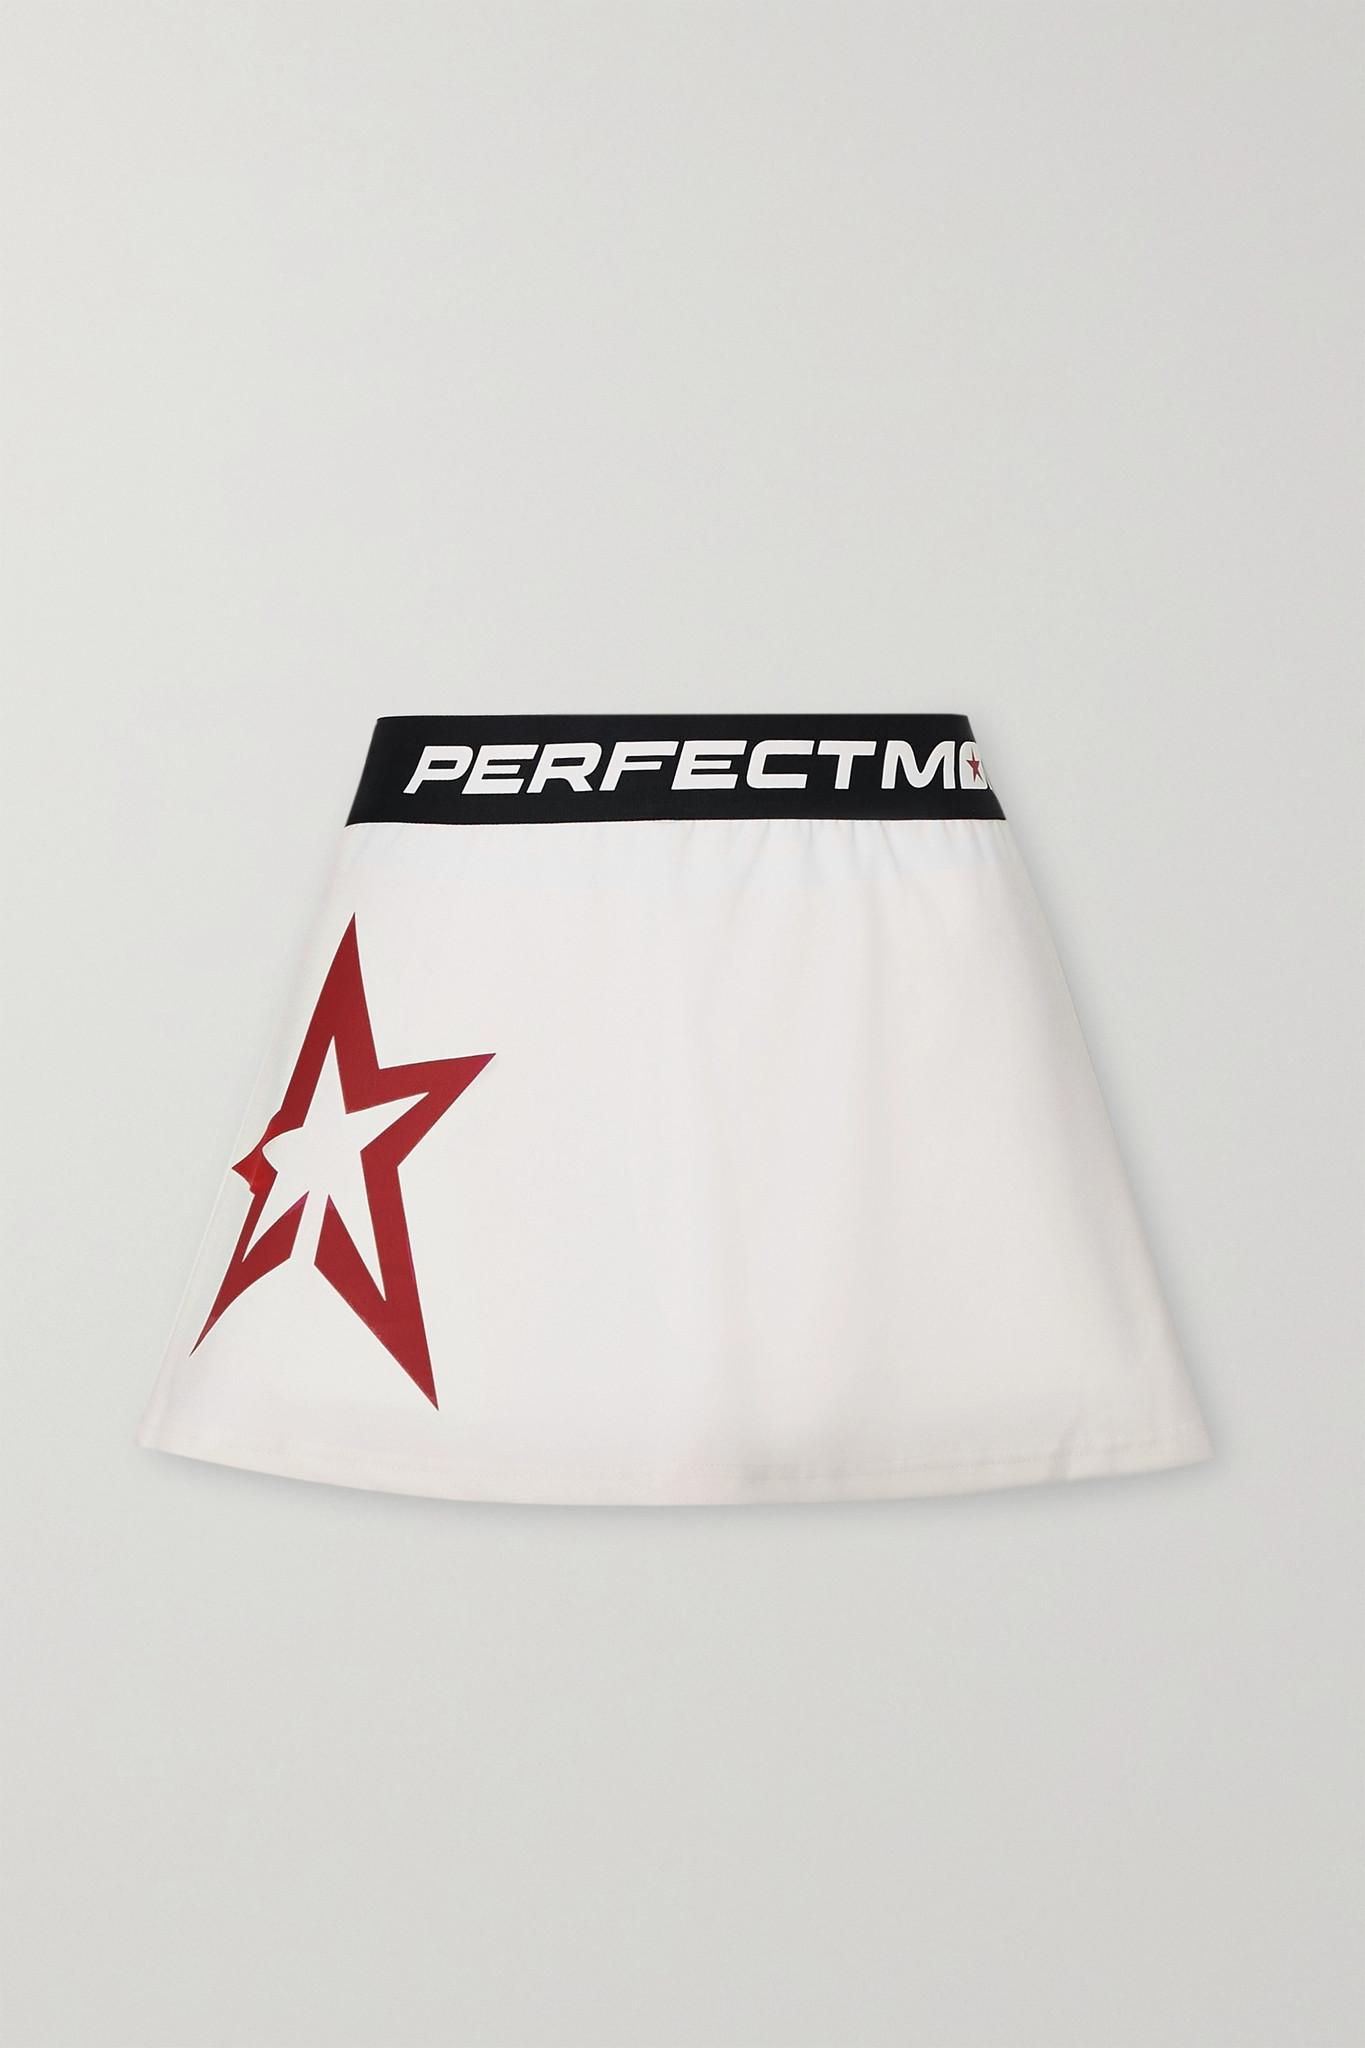 PERFECT MOMENT - Starlight Printed Jersey Tennis Skirt - White - medium